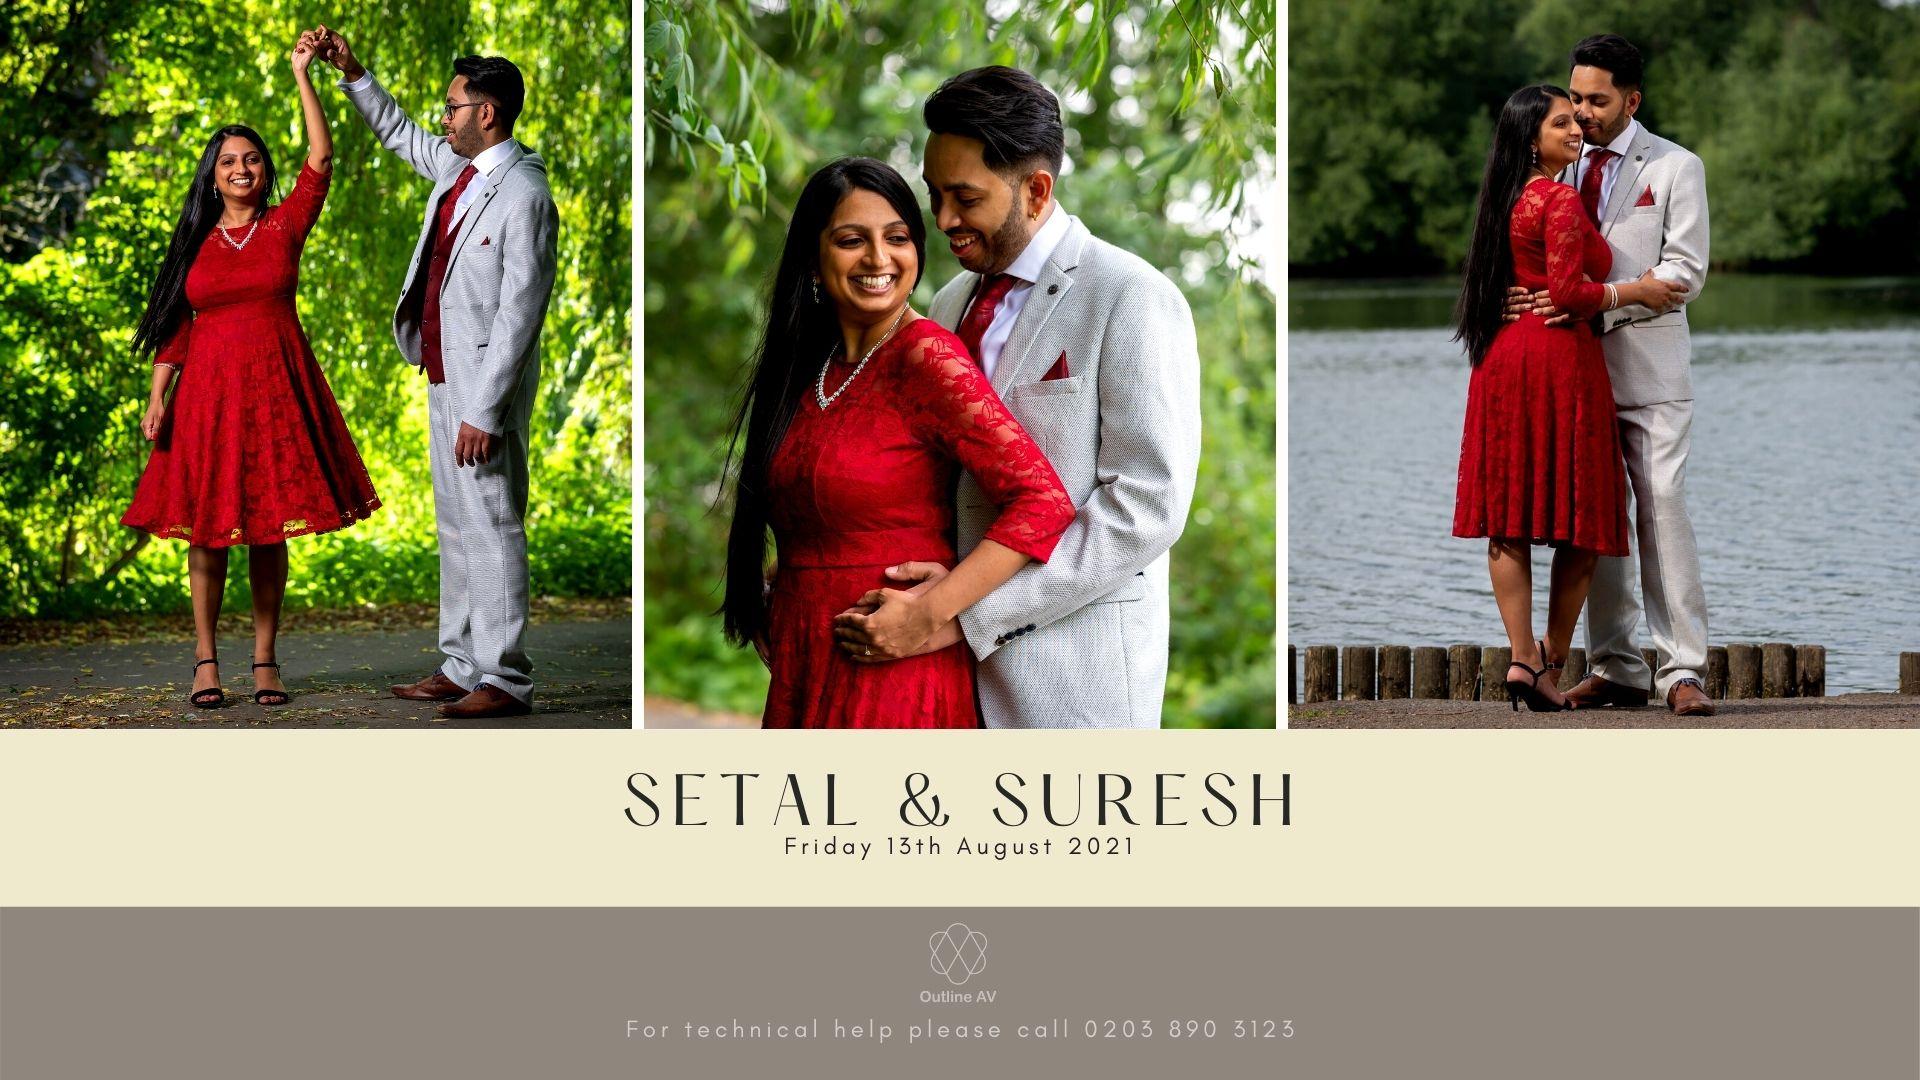 Setal & Suresh